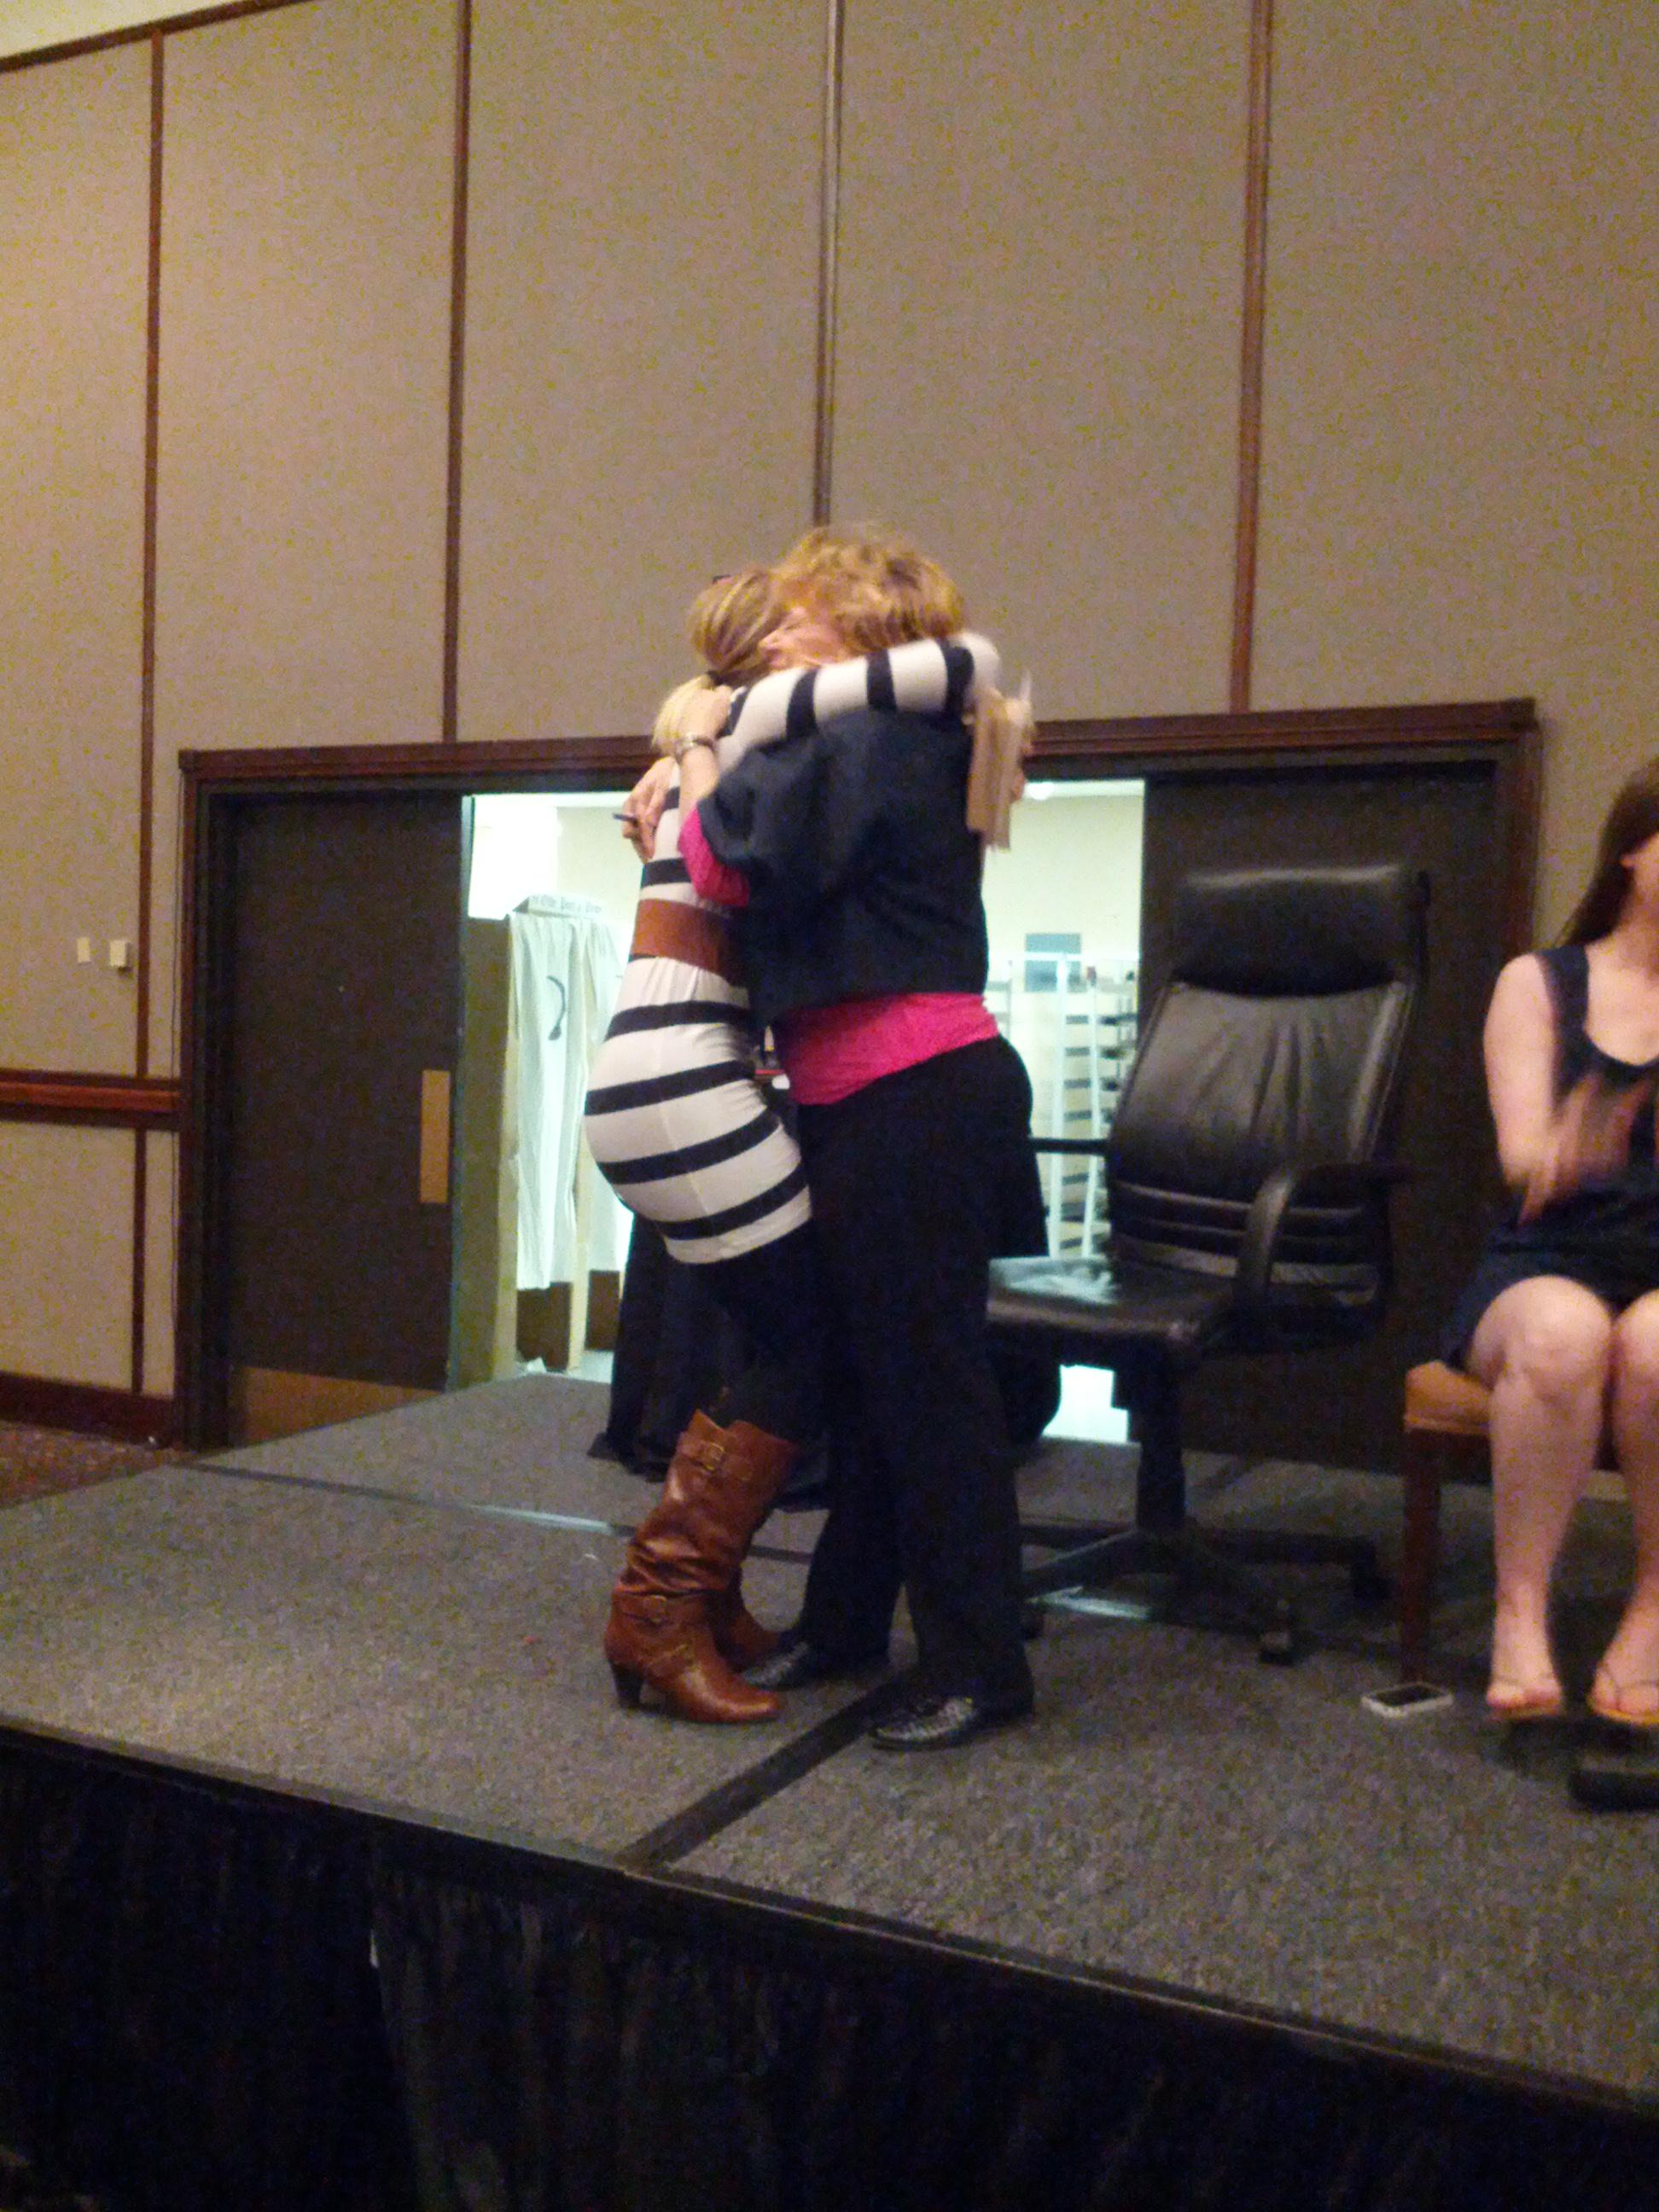 Gave Jude Deveraux a huge hug